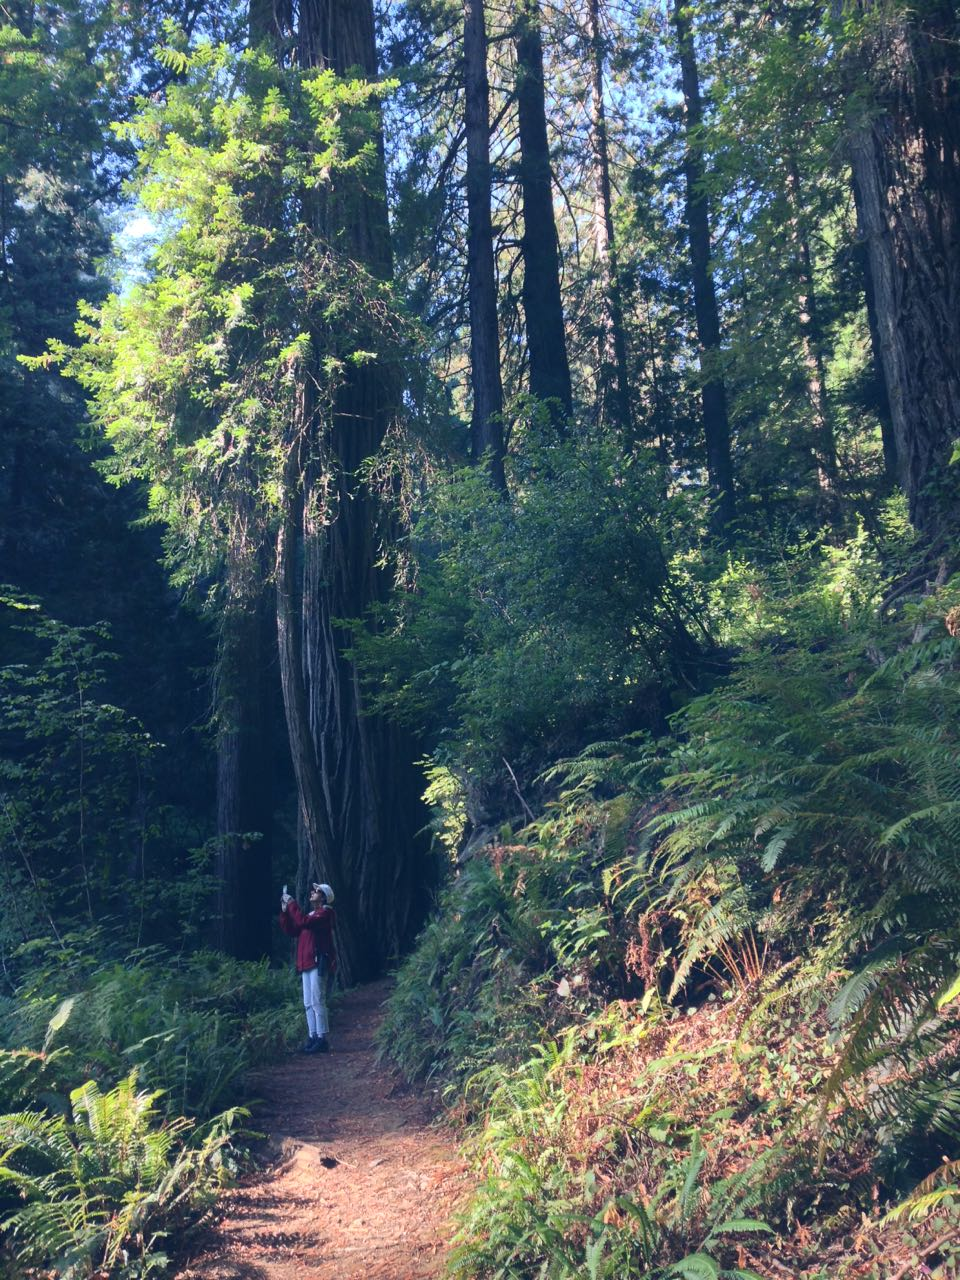 Redwoods 2017 10 08 214 Of 287